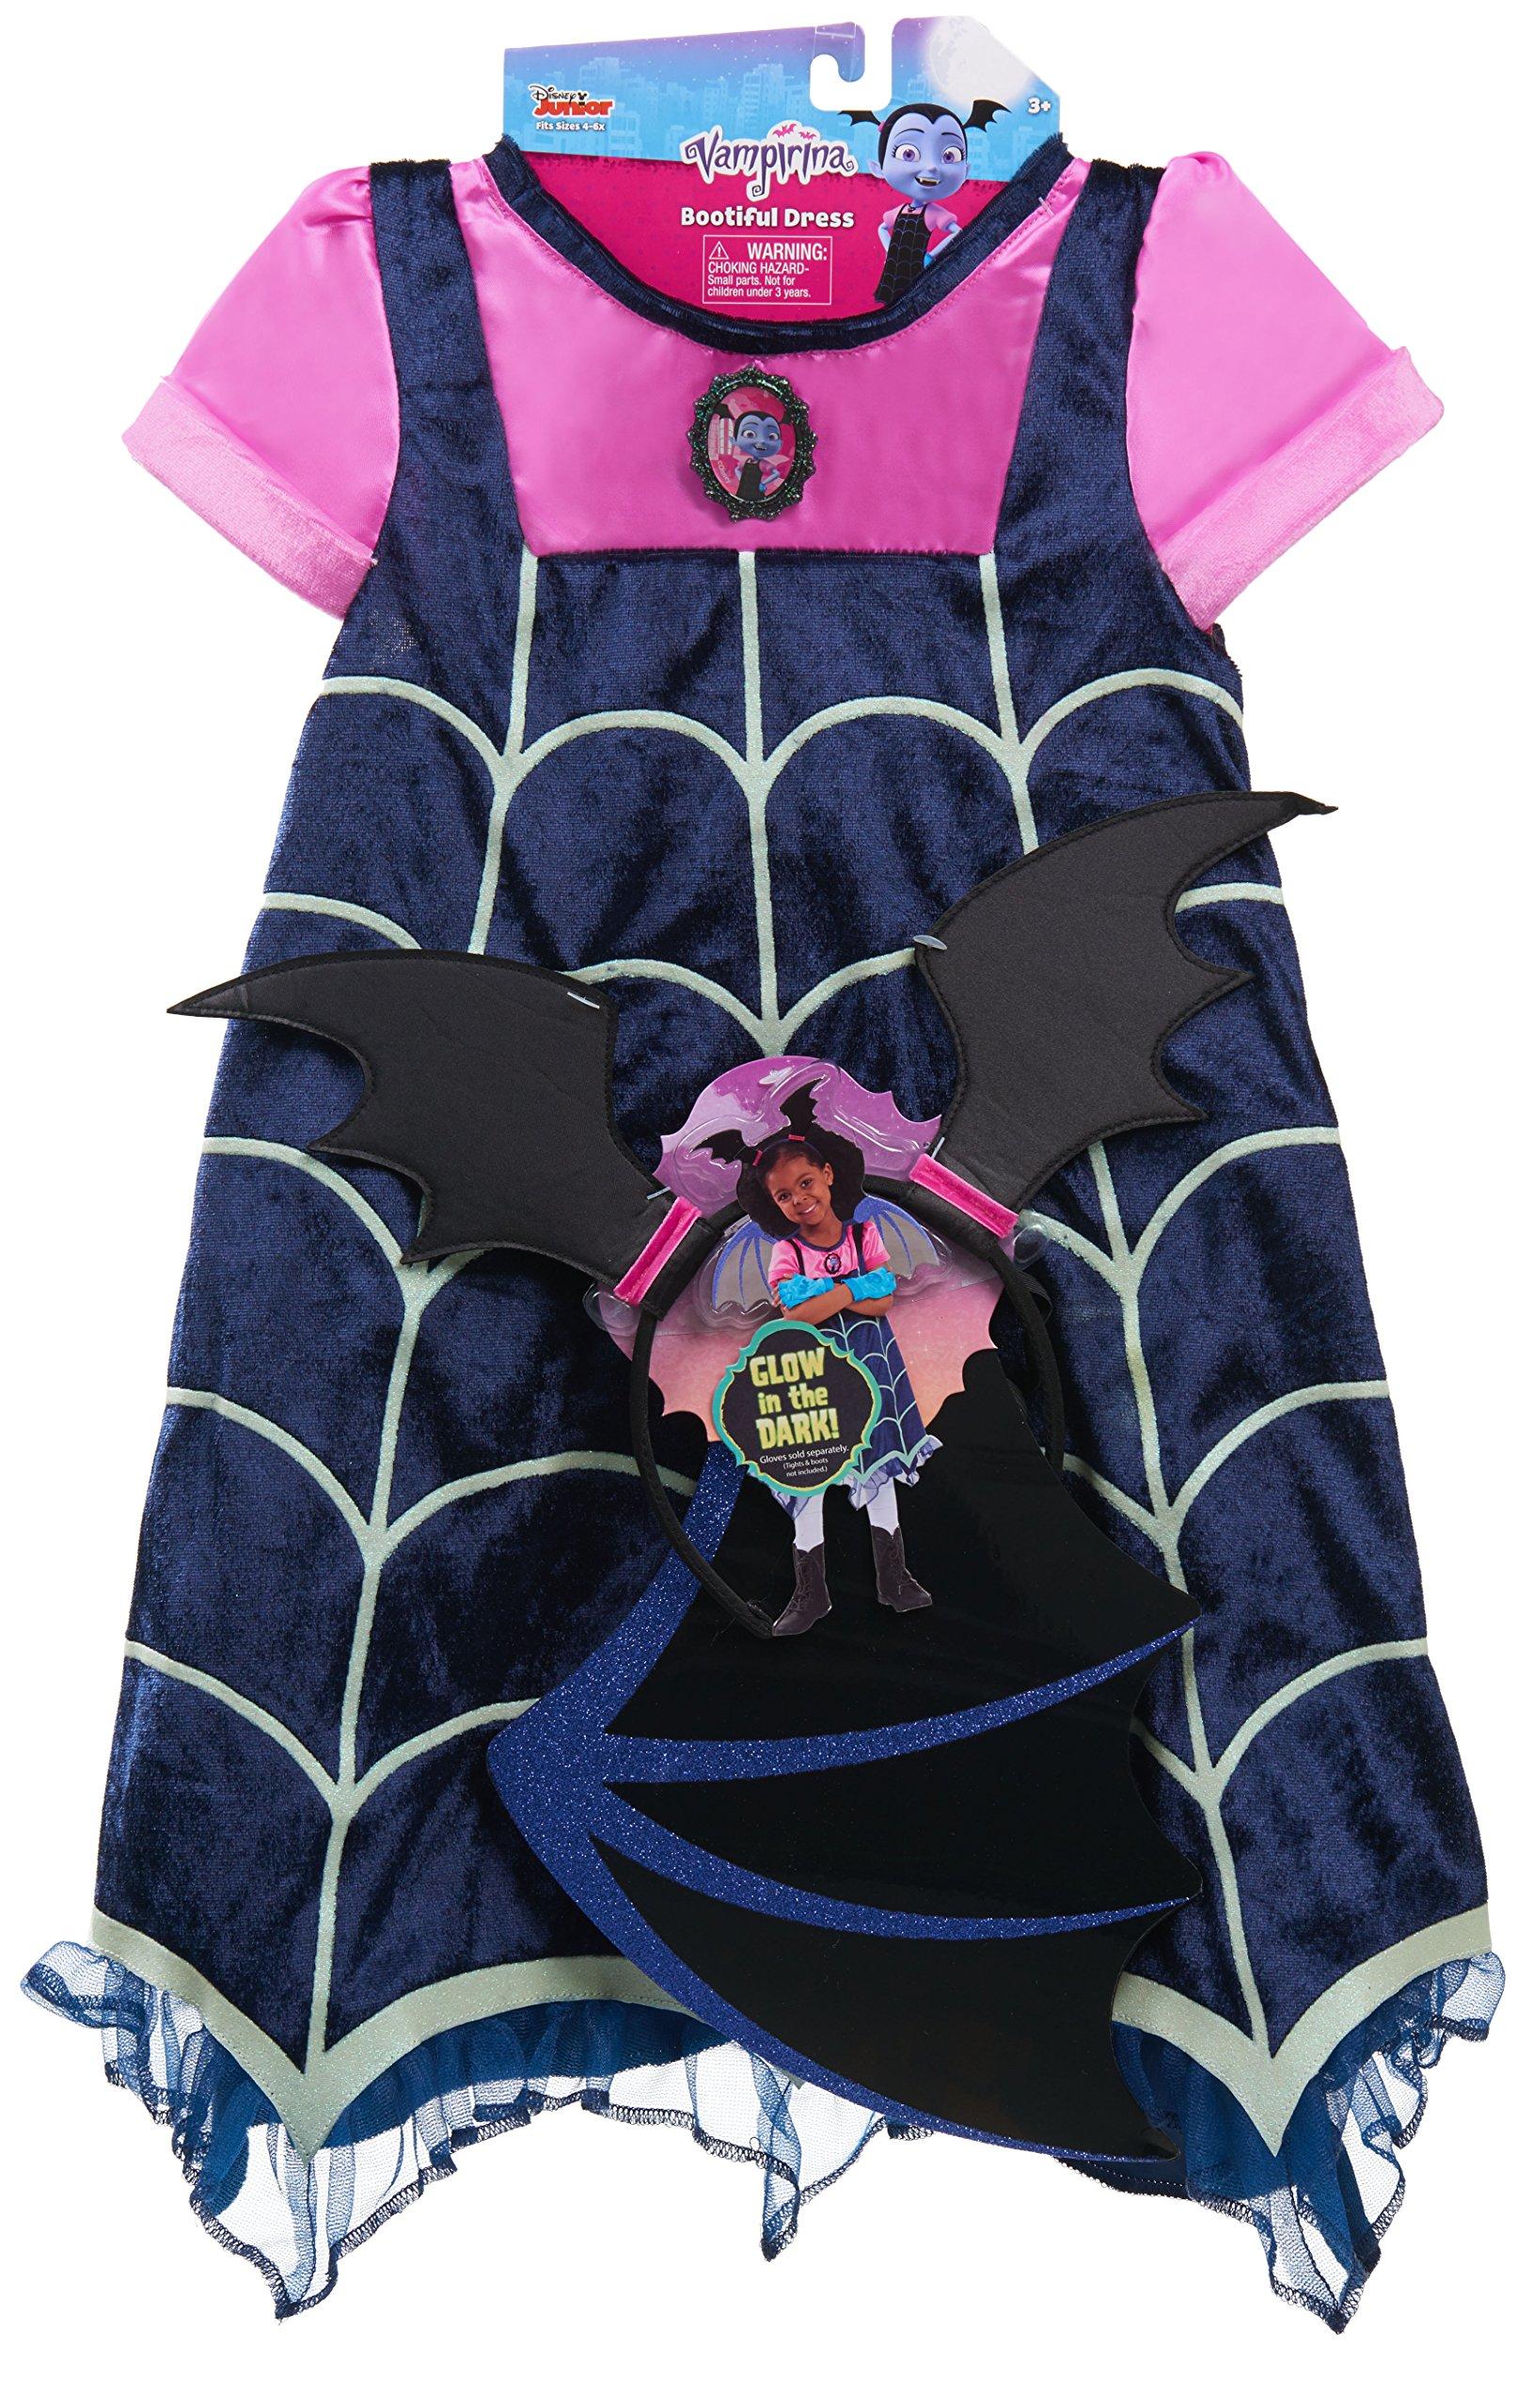 Vampirina 78050 Boo-Tiful Dress by Vampirina